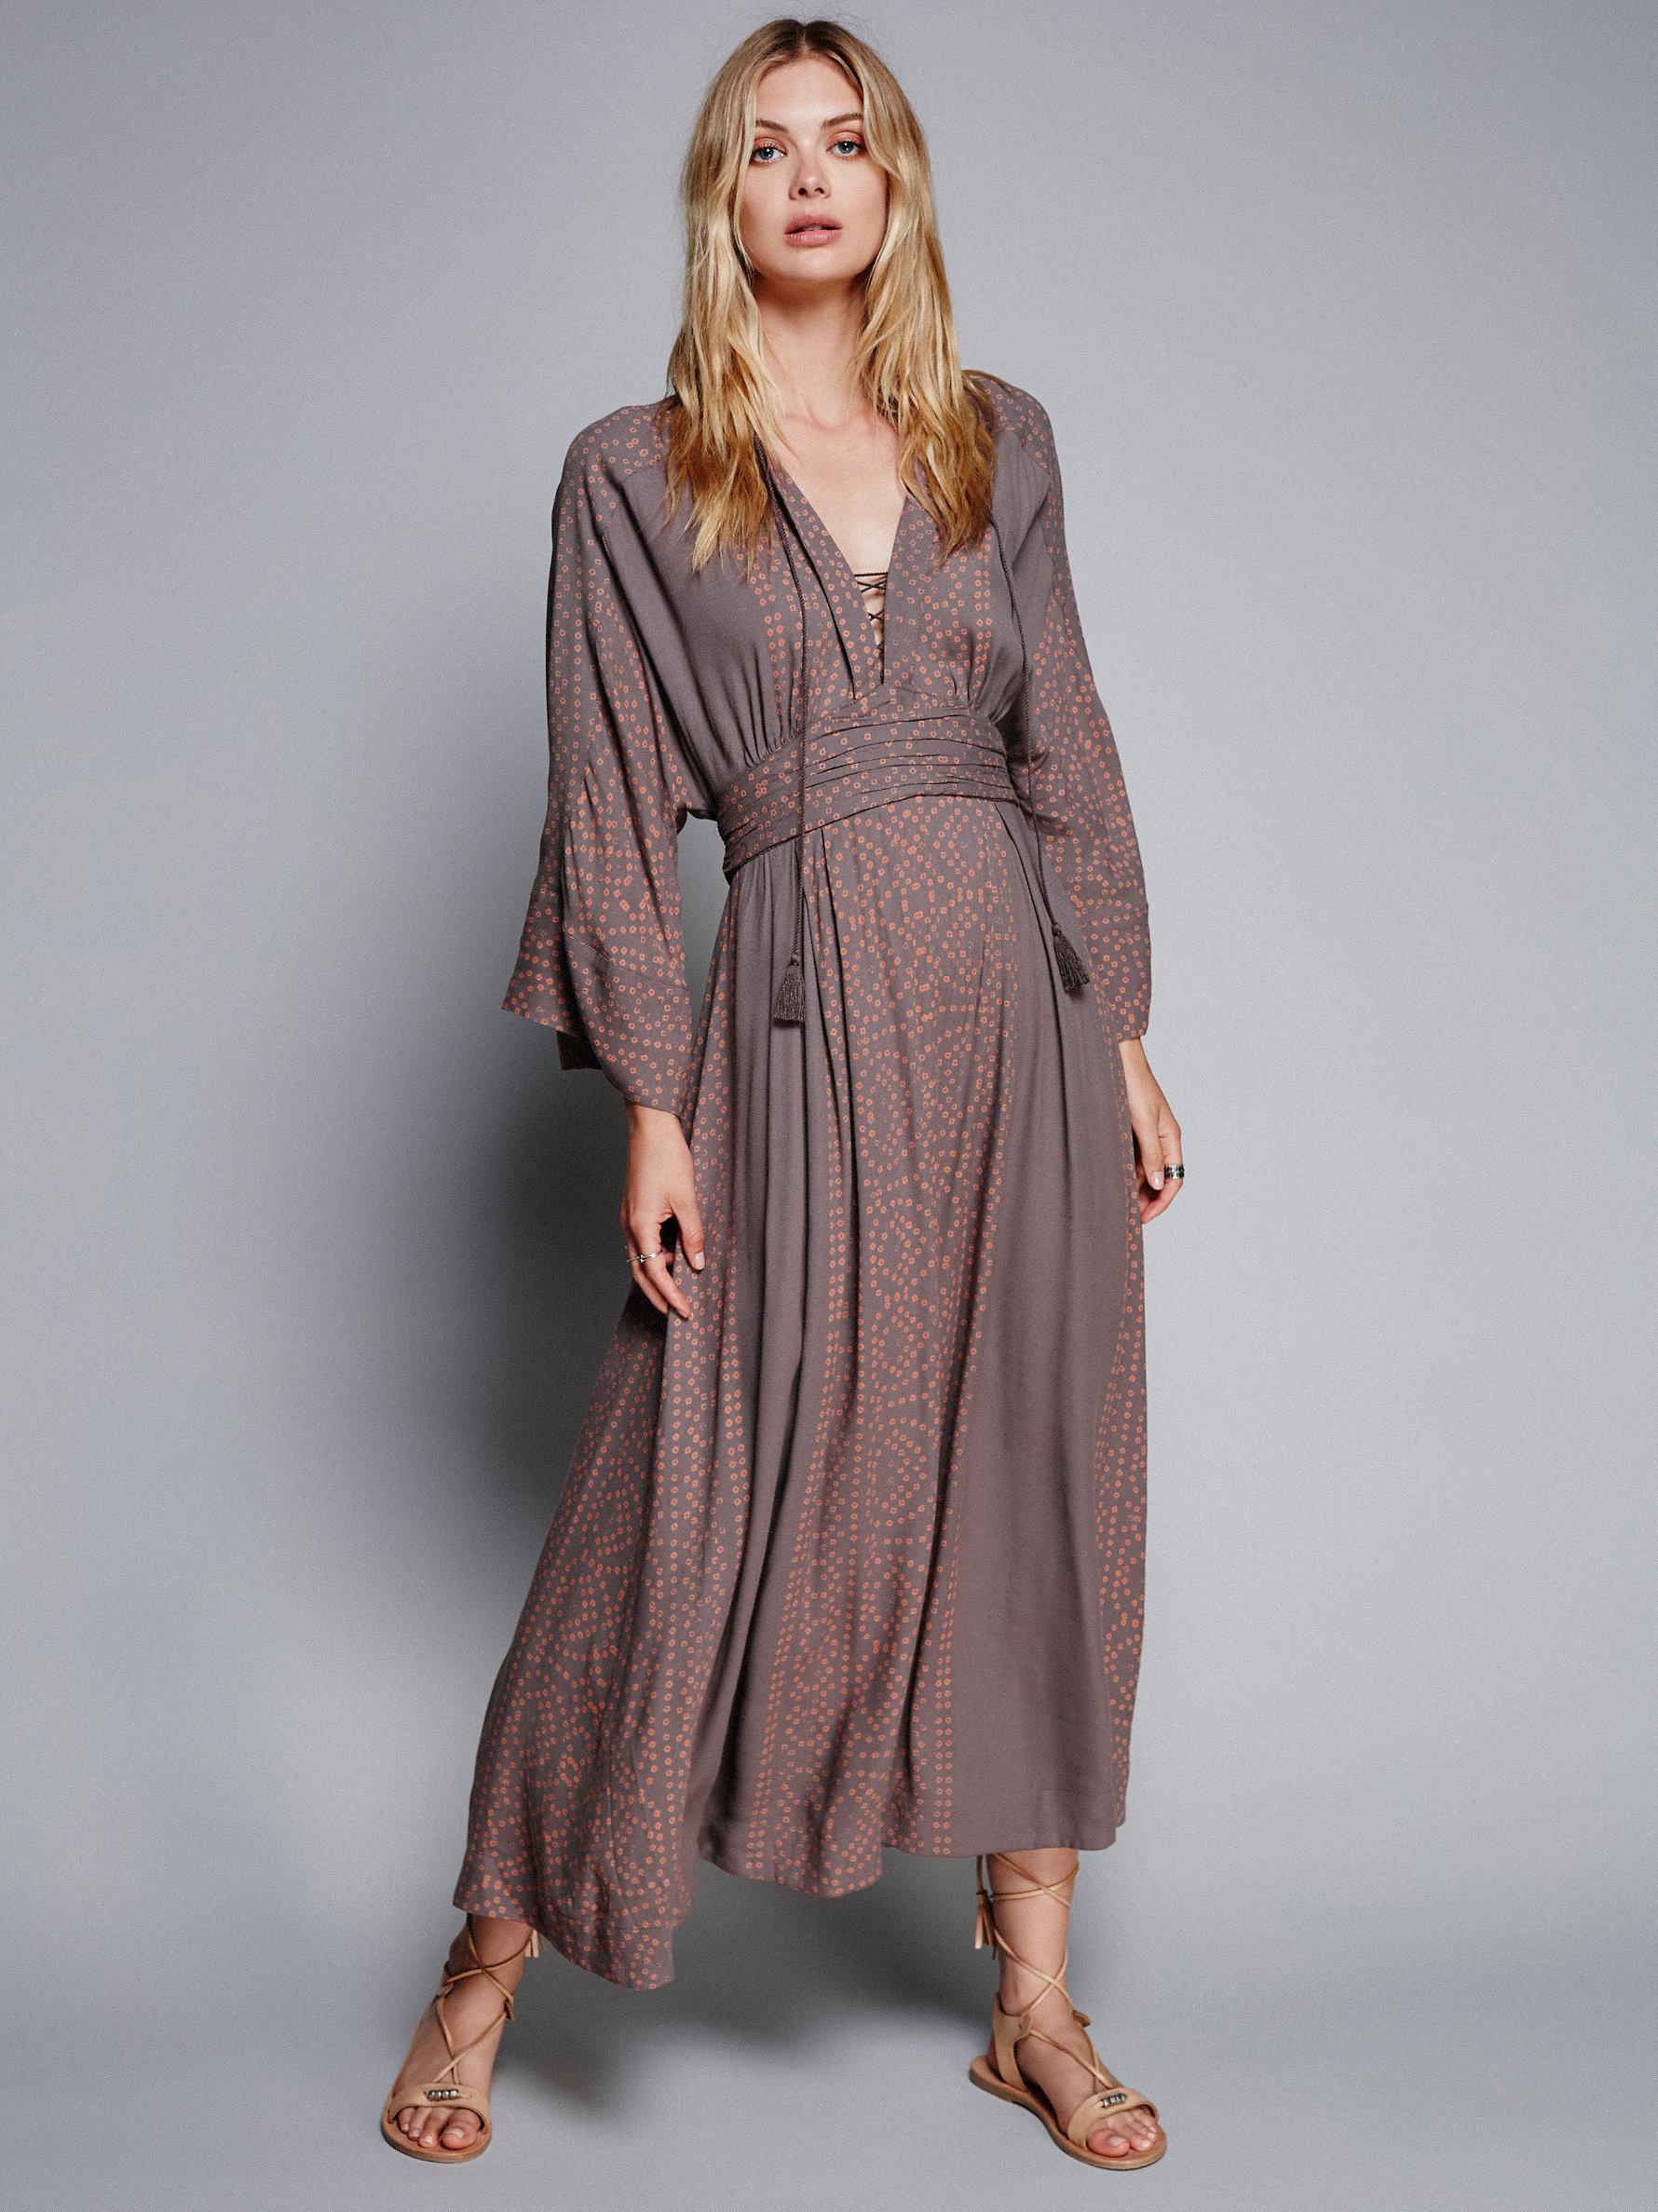 449566f5d6b09 Lyst - Free People Modern Kimono Dress in Gray